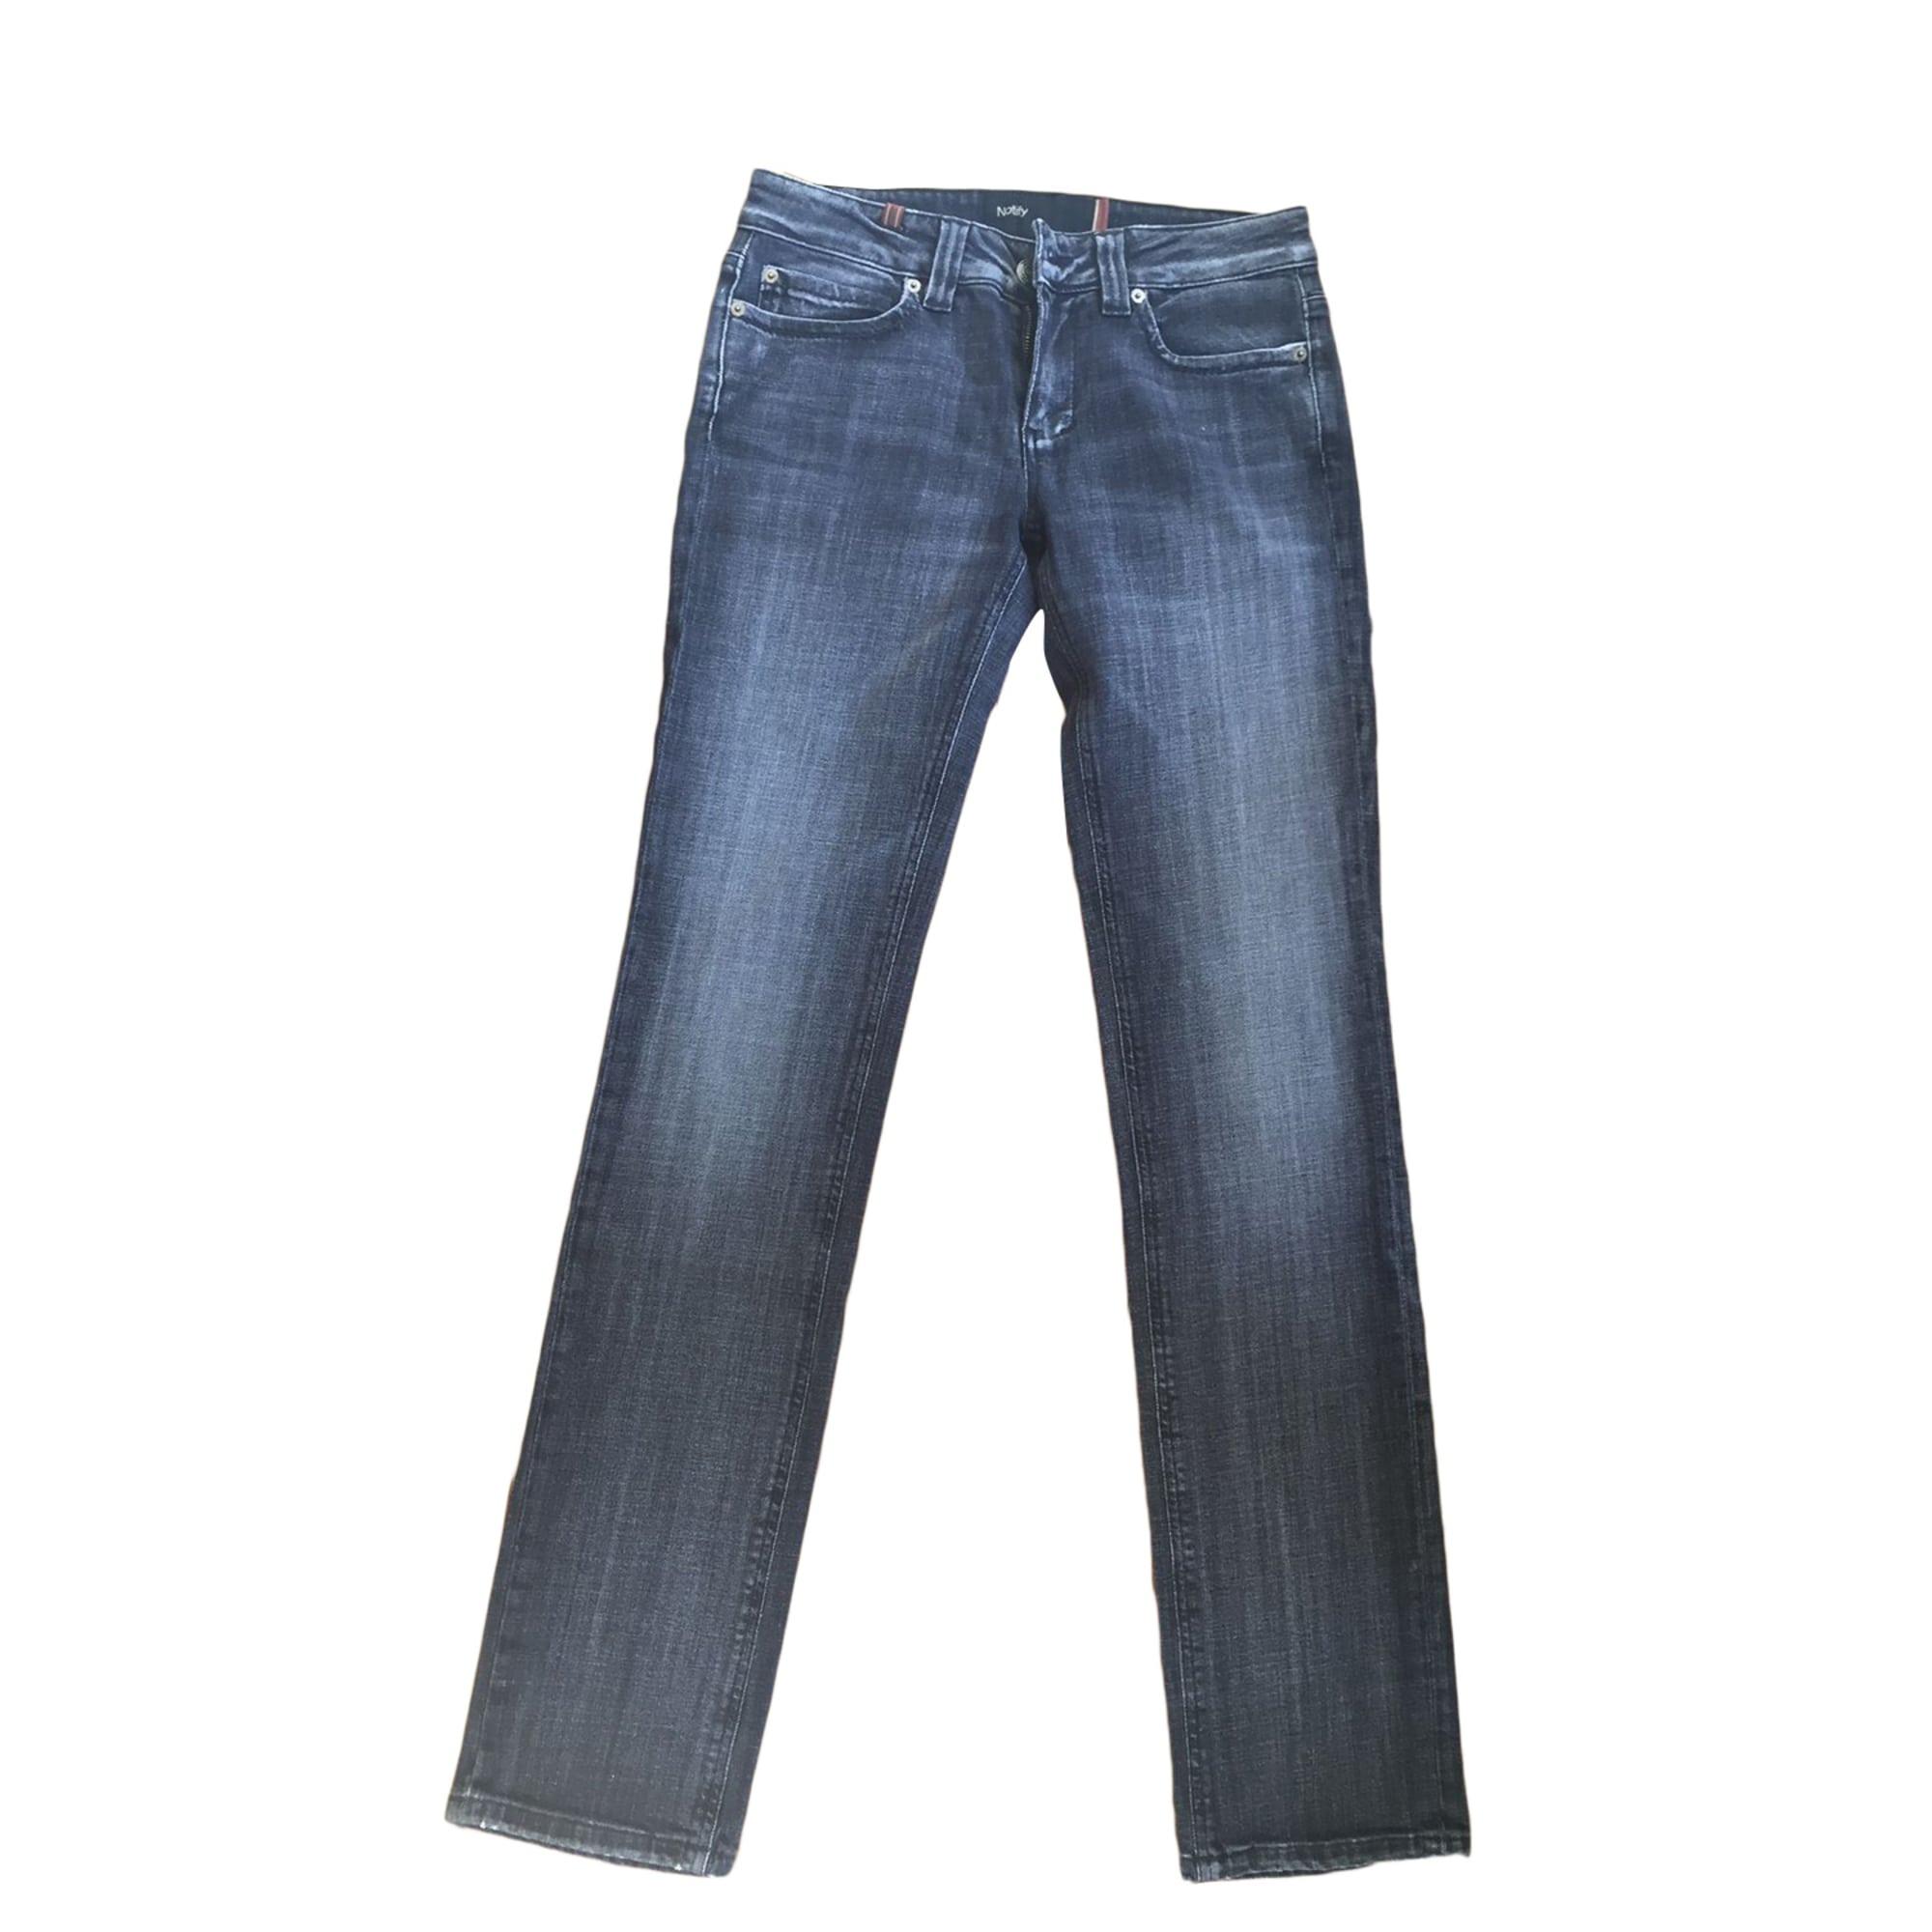 Jeans droit NOTIFY Gris, anthracite